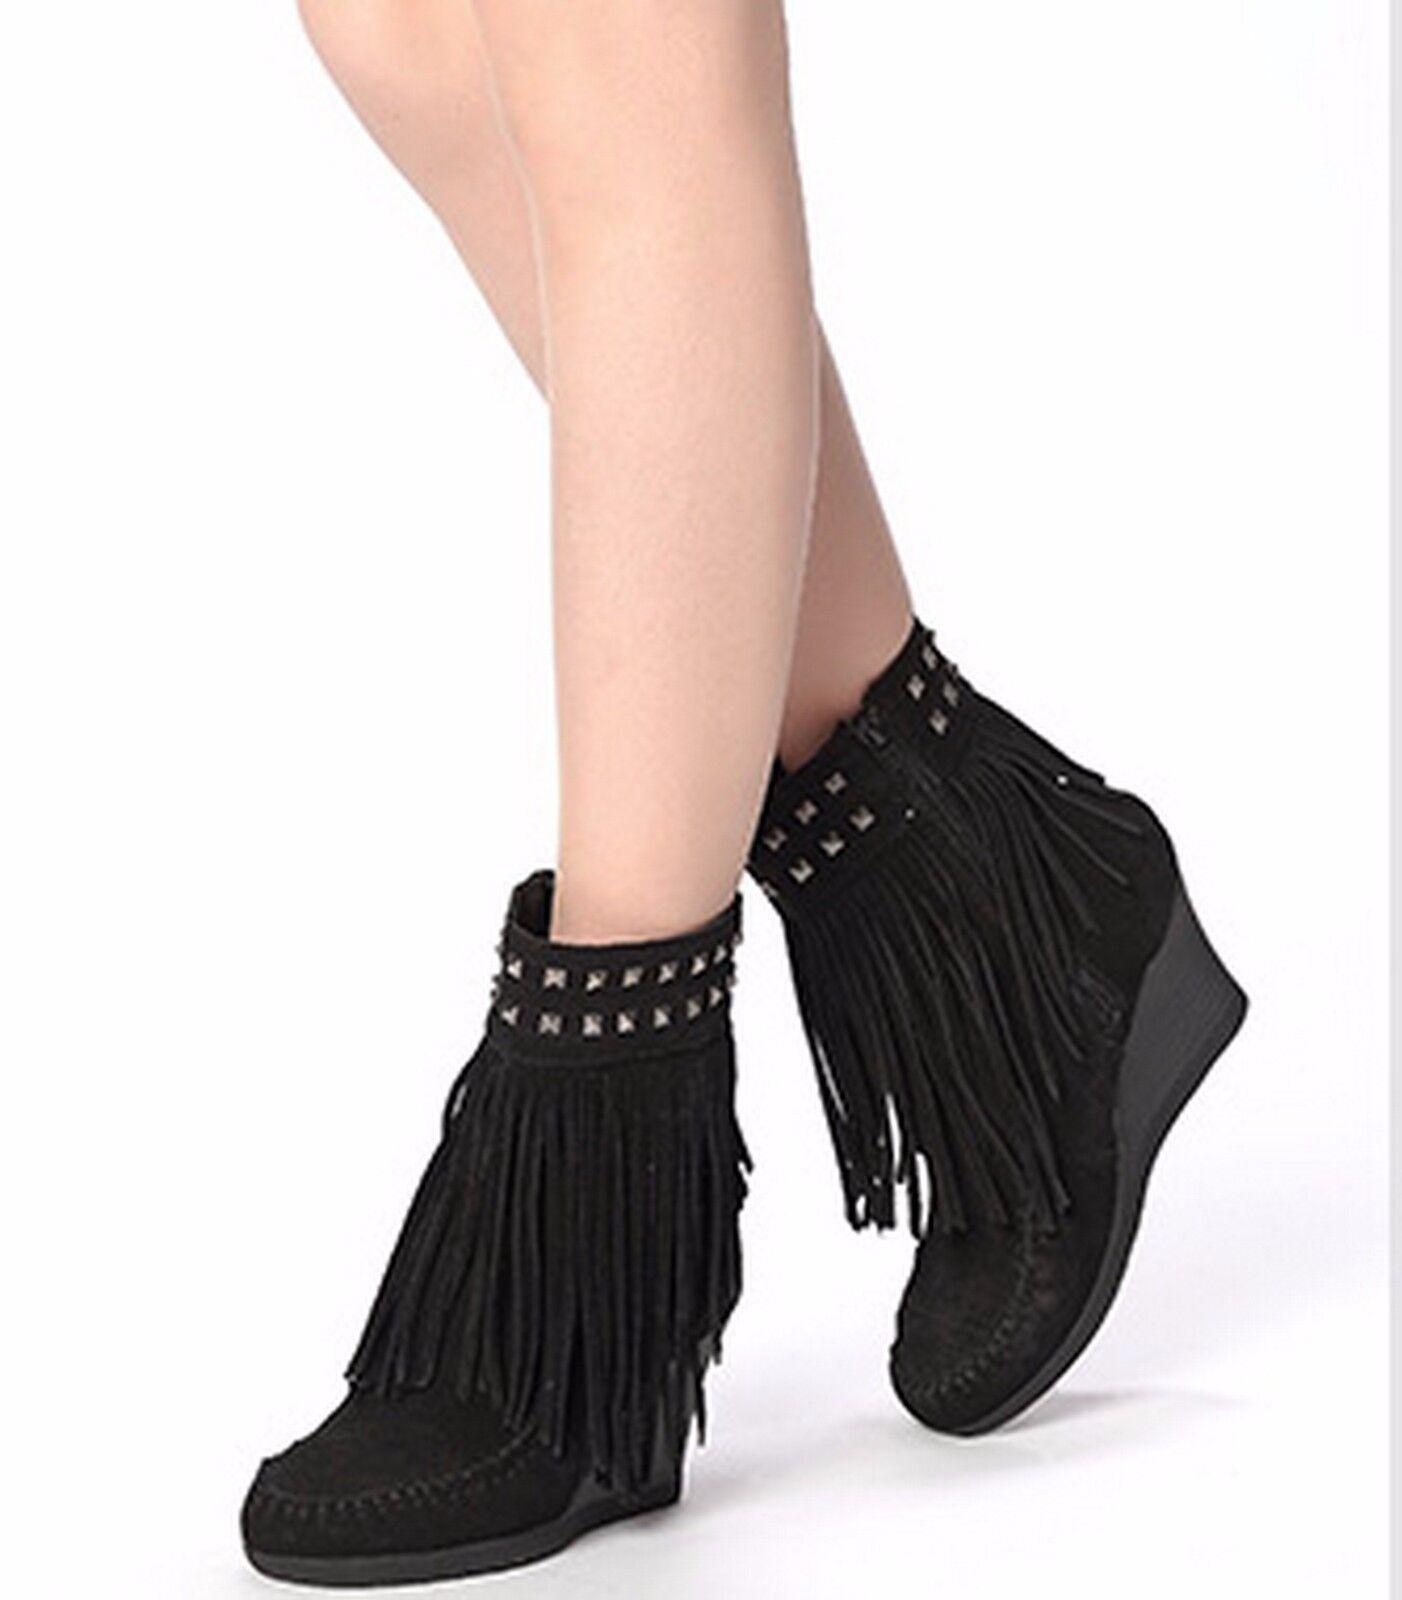 Nueva con caja Minnetonka Botín botas botas botas Zapatos De Gamuza, Negro, 7.5M  envío gratuito a nivel mundial